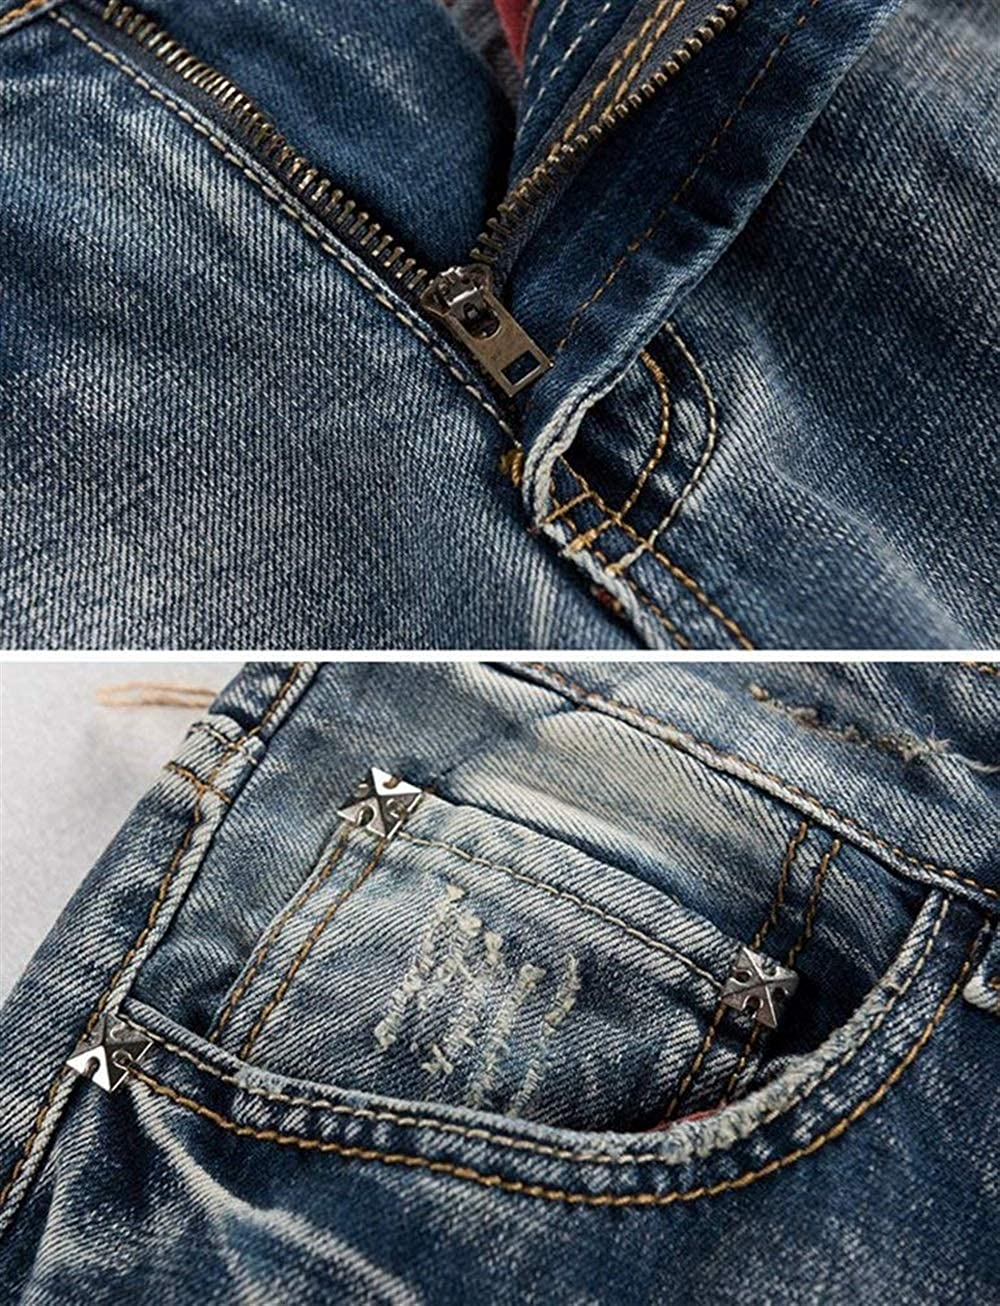 Anaisy Vintage Vintage Rasgados Agujeros Cher Jeans Stretch Motocicleta Jeans Denim Pantalones Pantalones Joven Pantalones